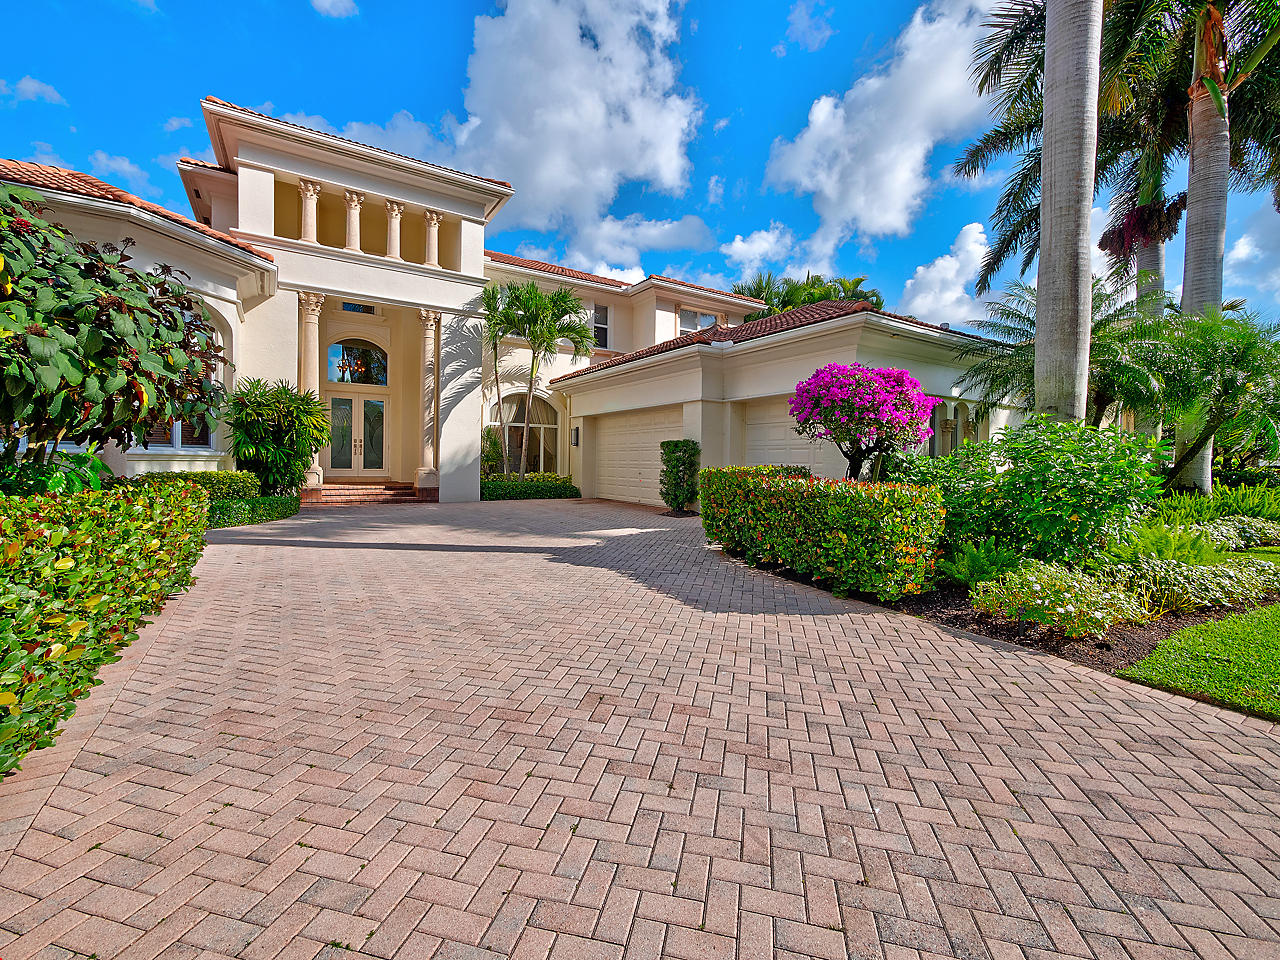 Photo of 118 Grand Palm Way, Palm Beach Gardens, FL 33418